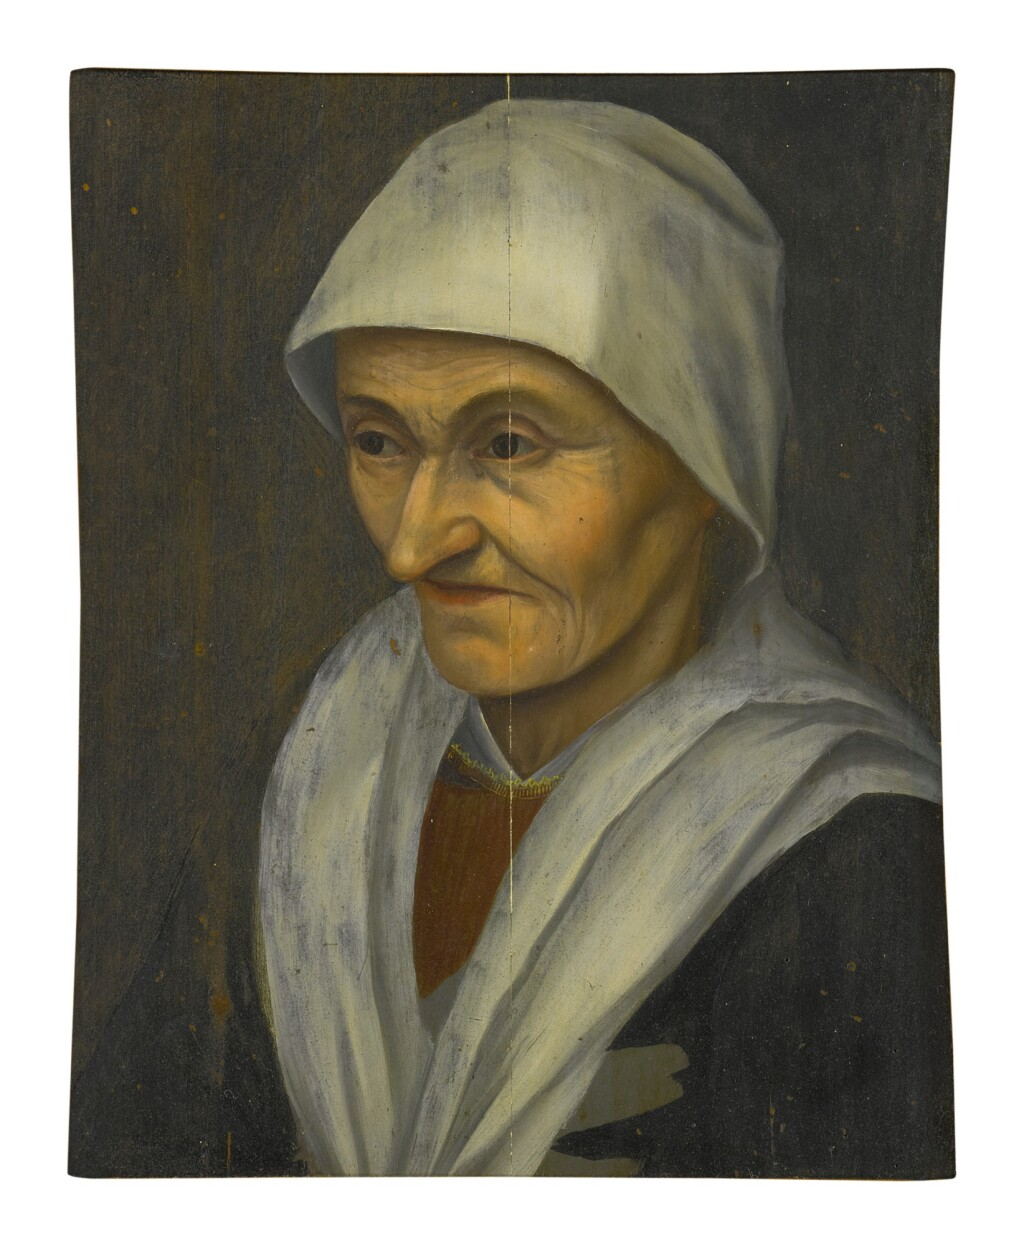 MANNER OF PIETER BRUEGEL THE ELDER   PORTRAIT OF A PEASANT WOMAN, HALF LENGTH, FACING LEFT